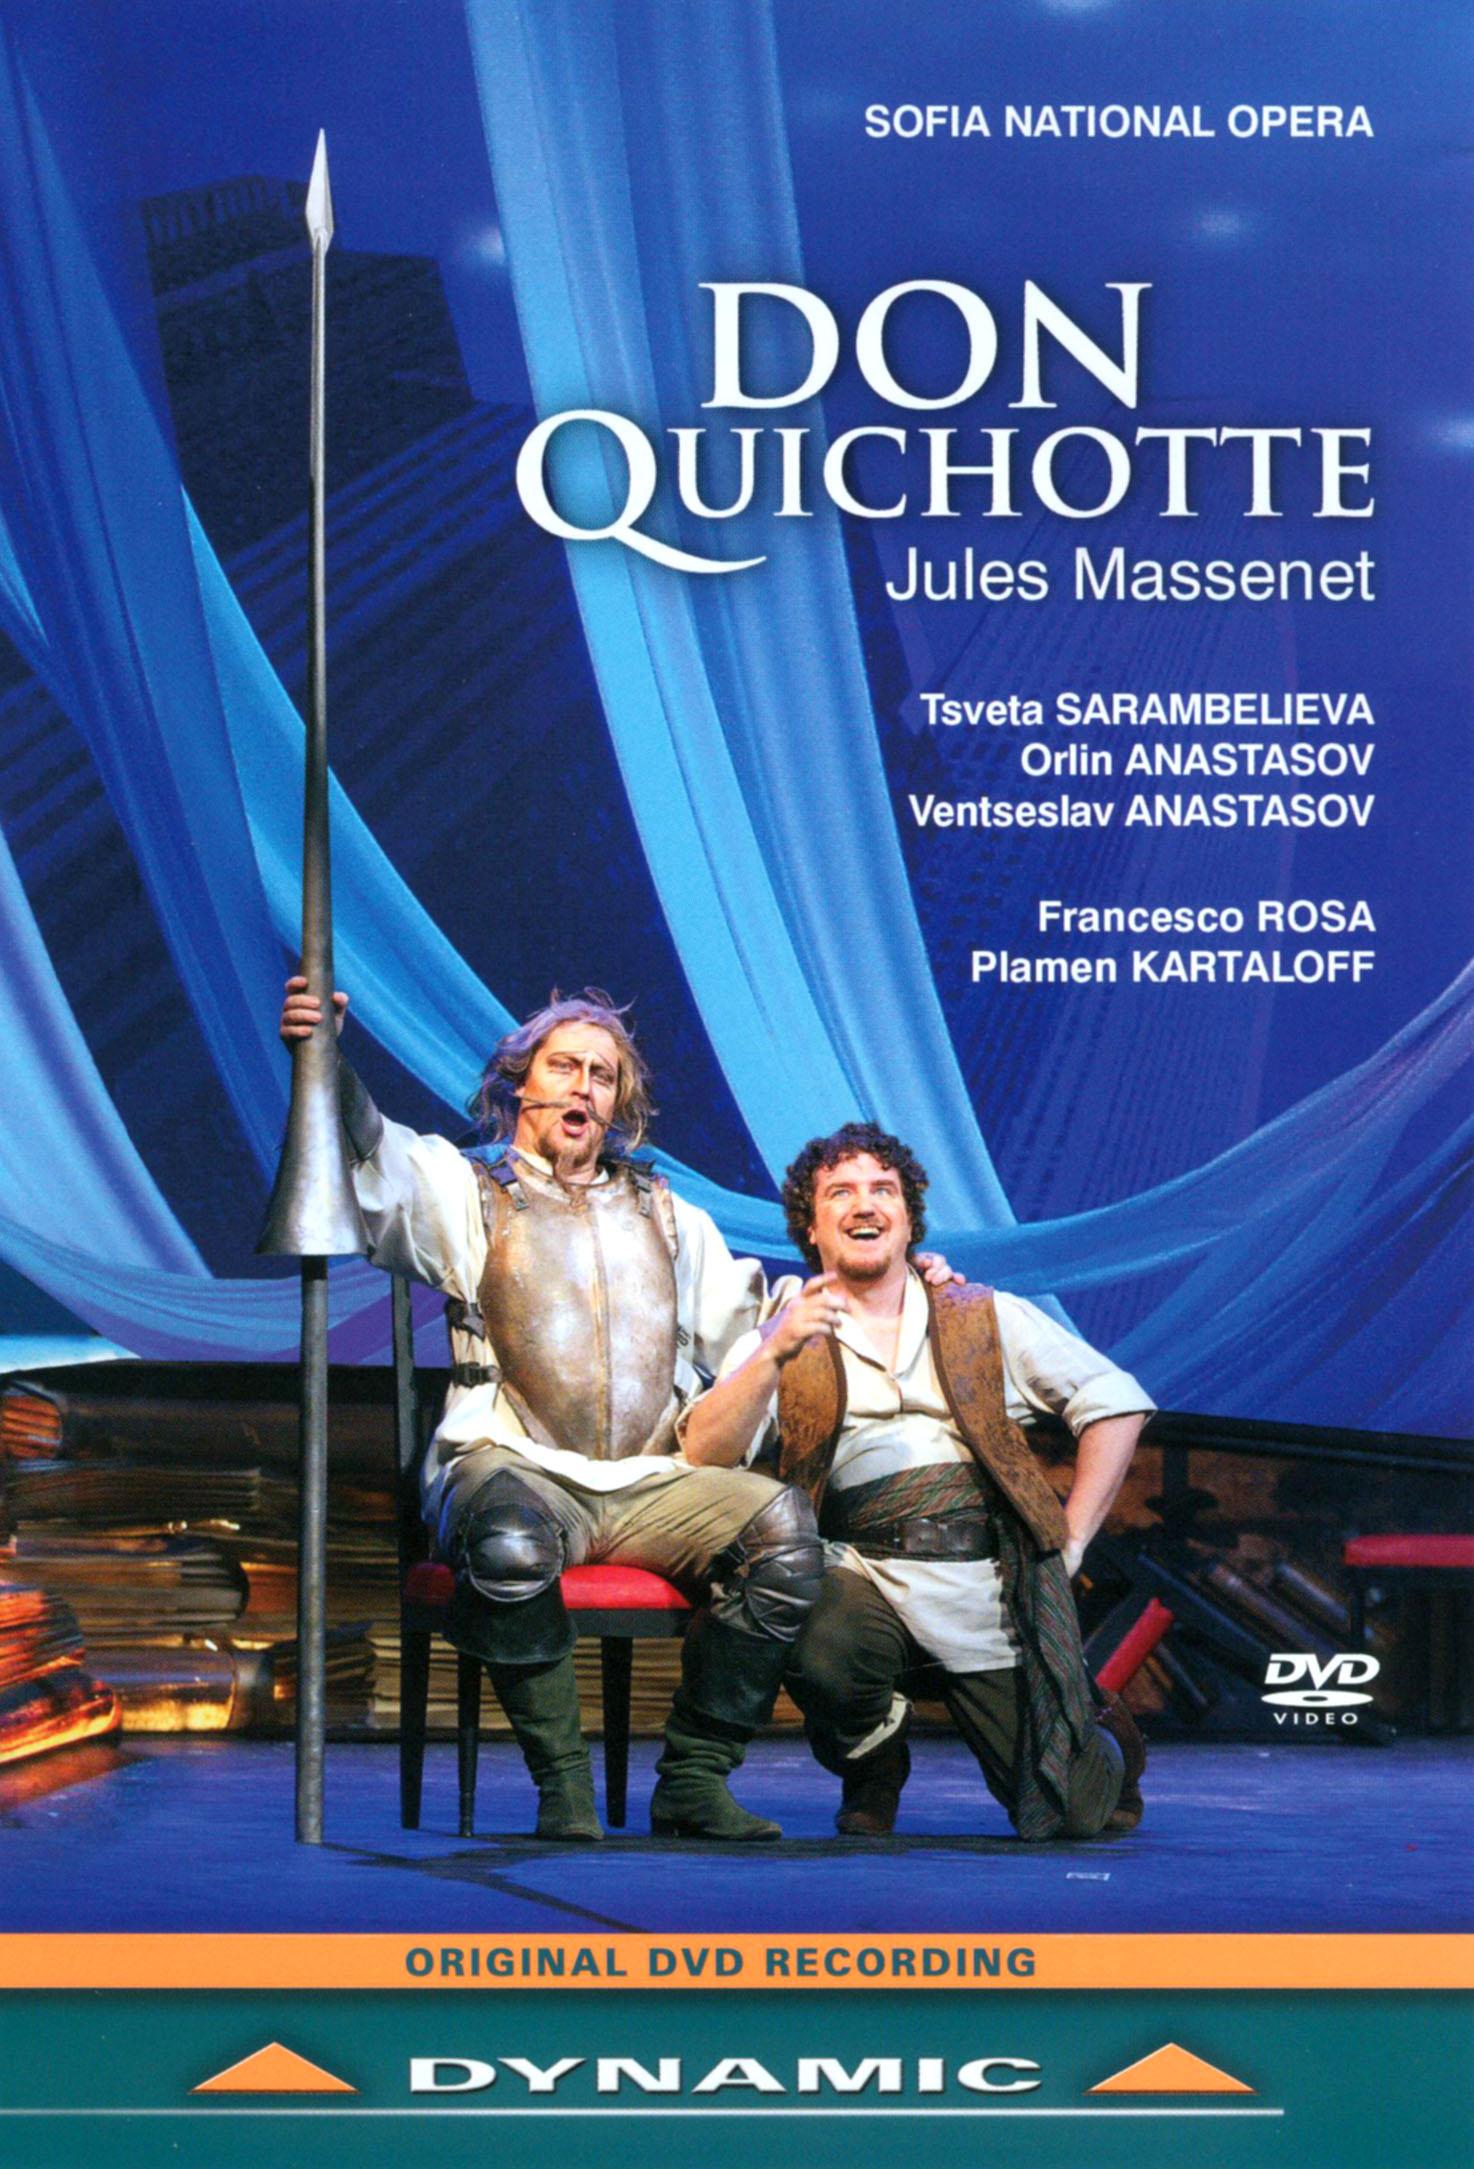 Don Quichotte (Sofia National Opera)